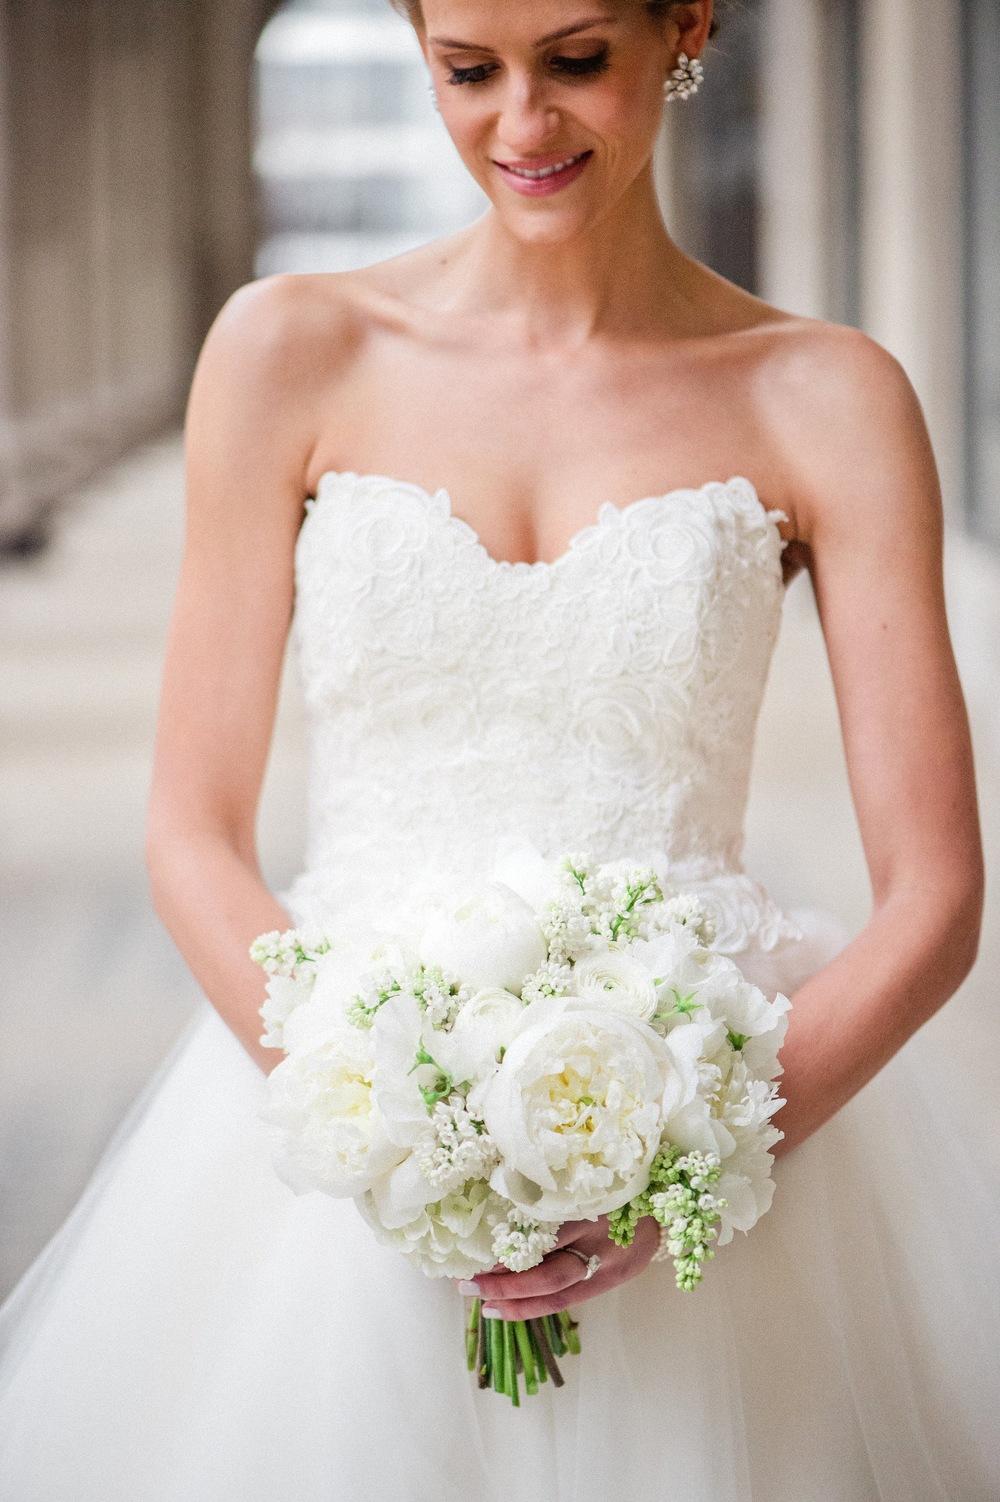 Fleur bridal bouquet, photo by Amanda Megan Miller, with Jayne Weddings